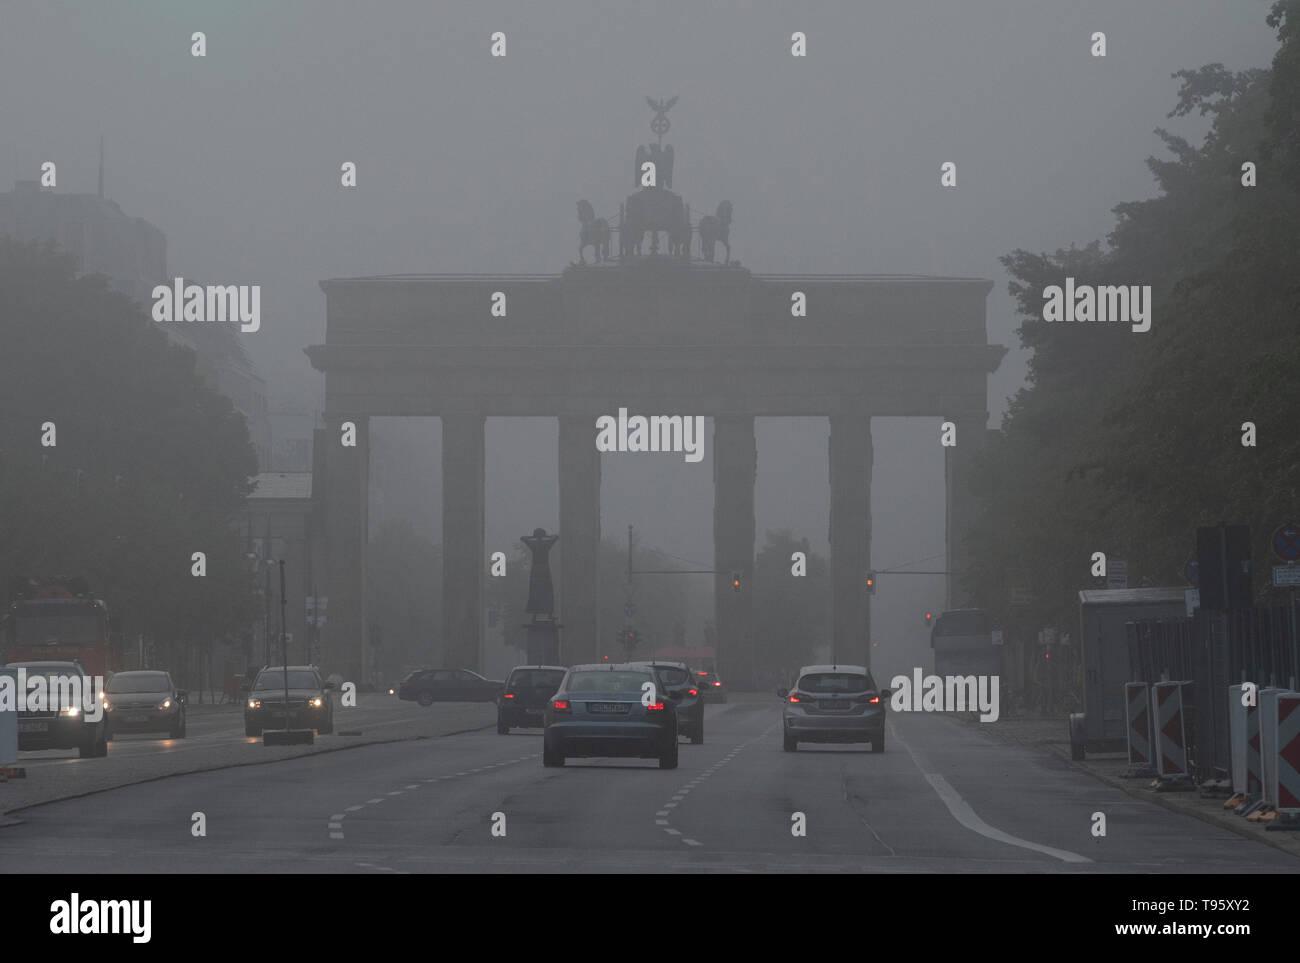 Berlin, Deutschland. 17 Mai, 2019. Dichter Nebel umhüllt das Brandenburger Tor am Morgen. Credit: Paul Zinken/dpa/Alamy leben Nachrichten Stockfoto